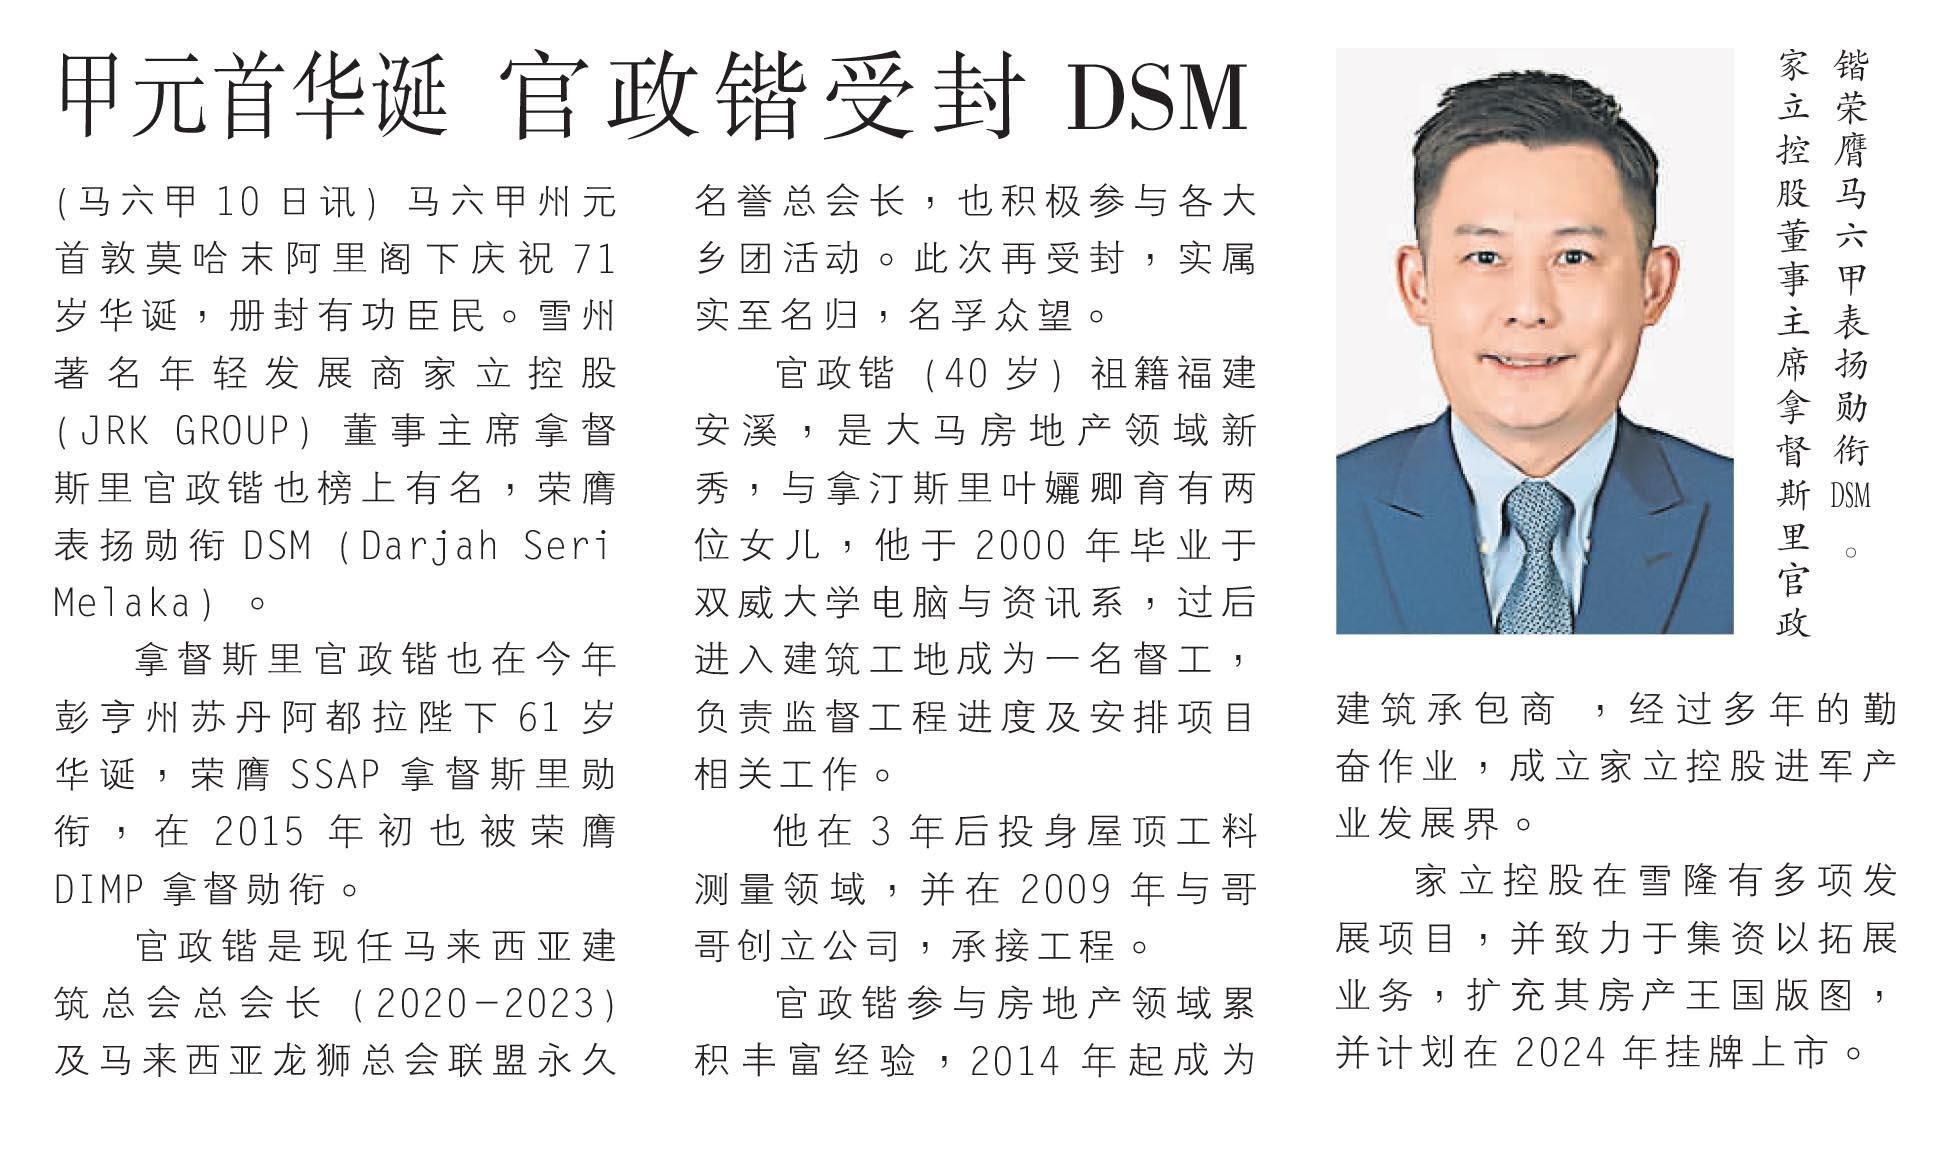 20201010 DSM Title Write-Up (NanYang)